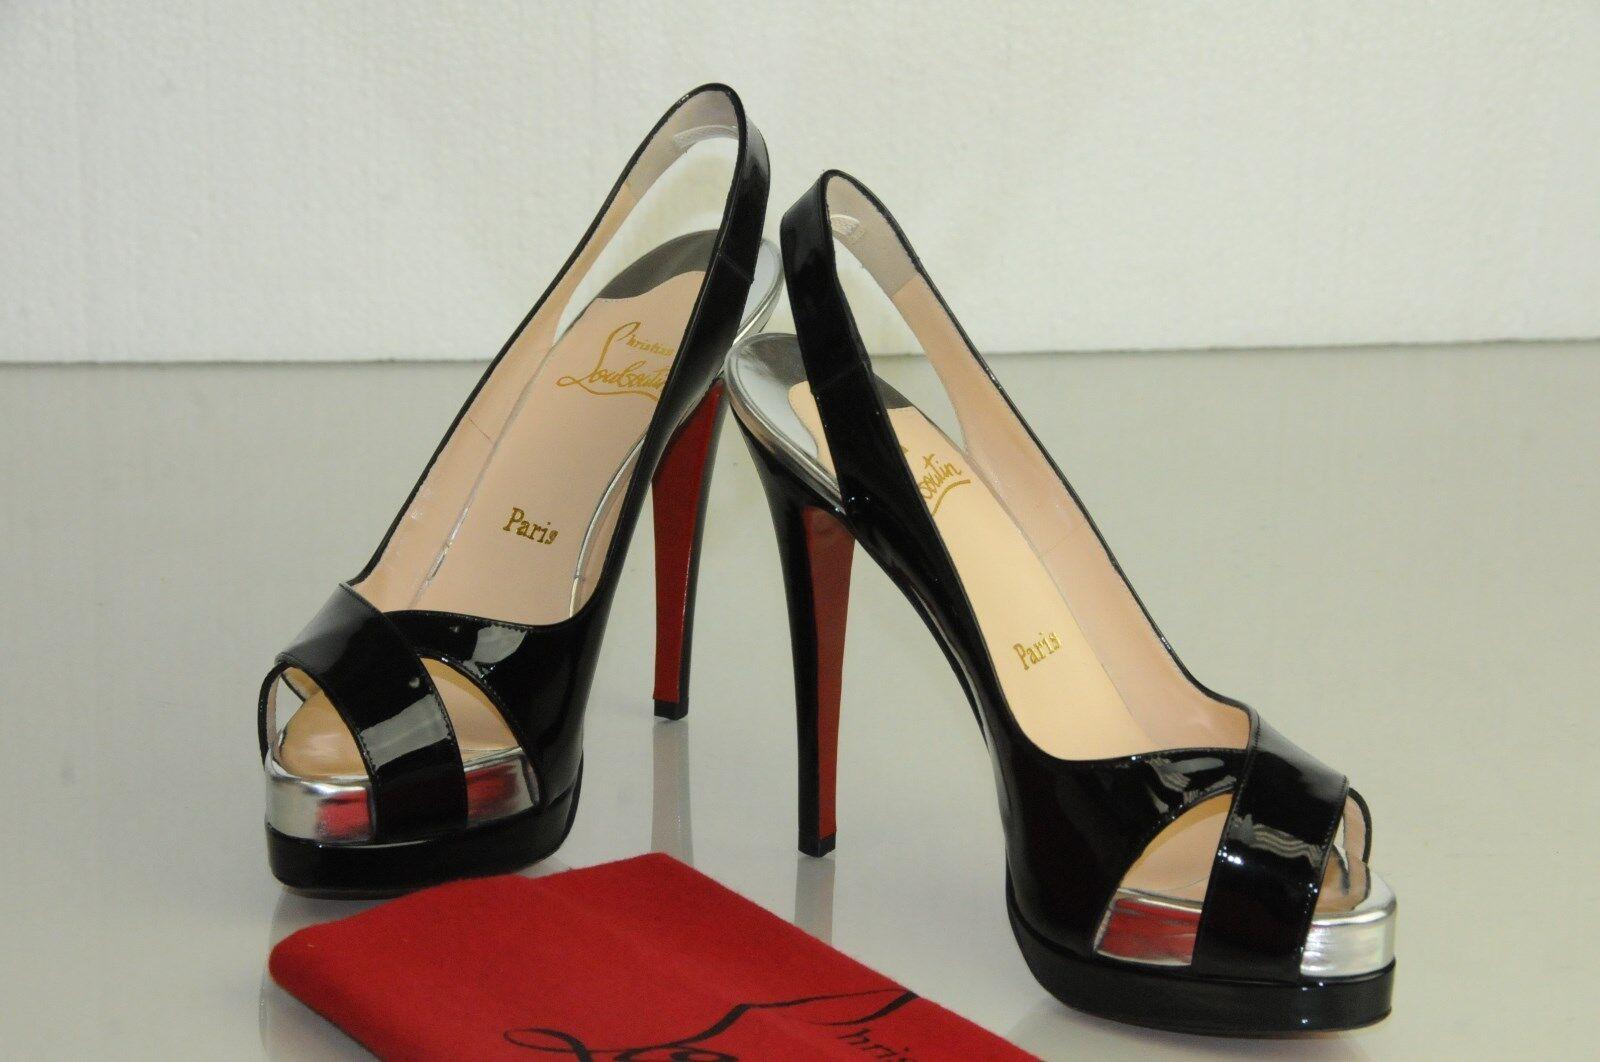 New Christian Christian Christian Louboutin VERY CROISE 140 Patent Calf shoes 39 00b977